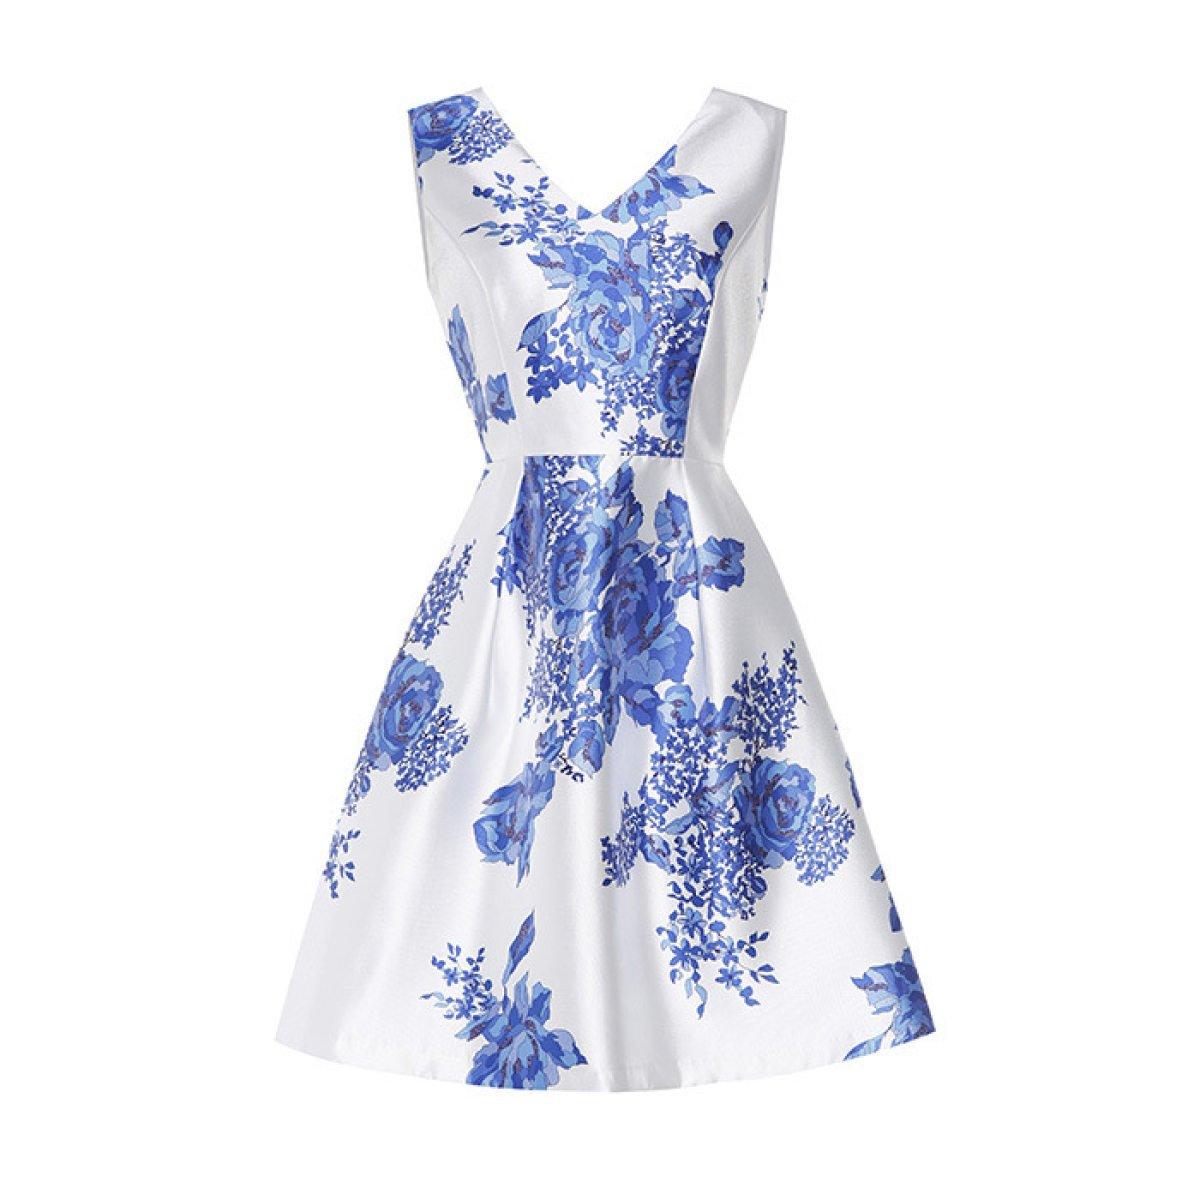 China Palaeowind Women 's Spring And Summer Fashion V - Neck Print Dress Dress Skirt,Blue-XL